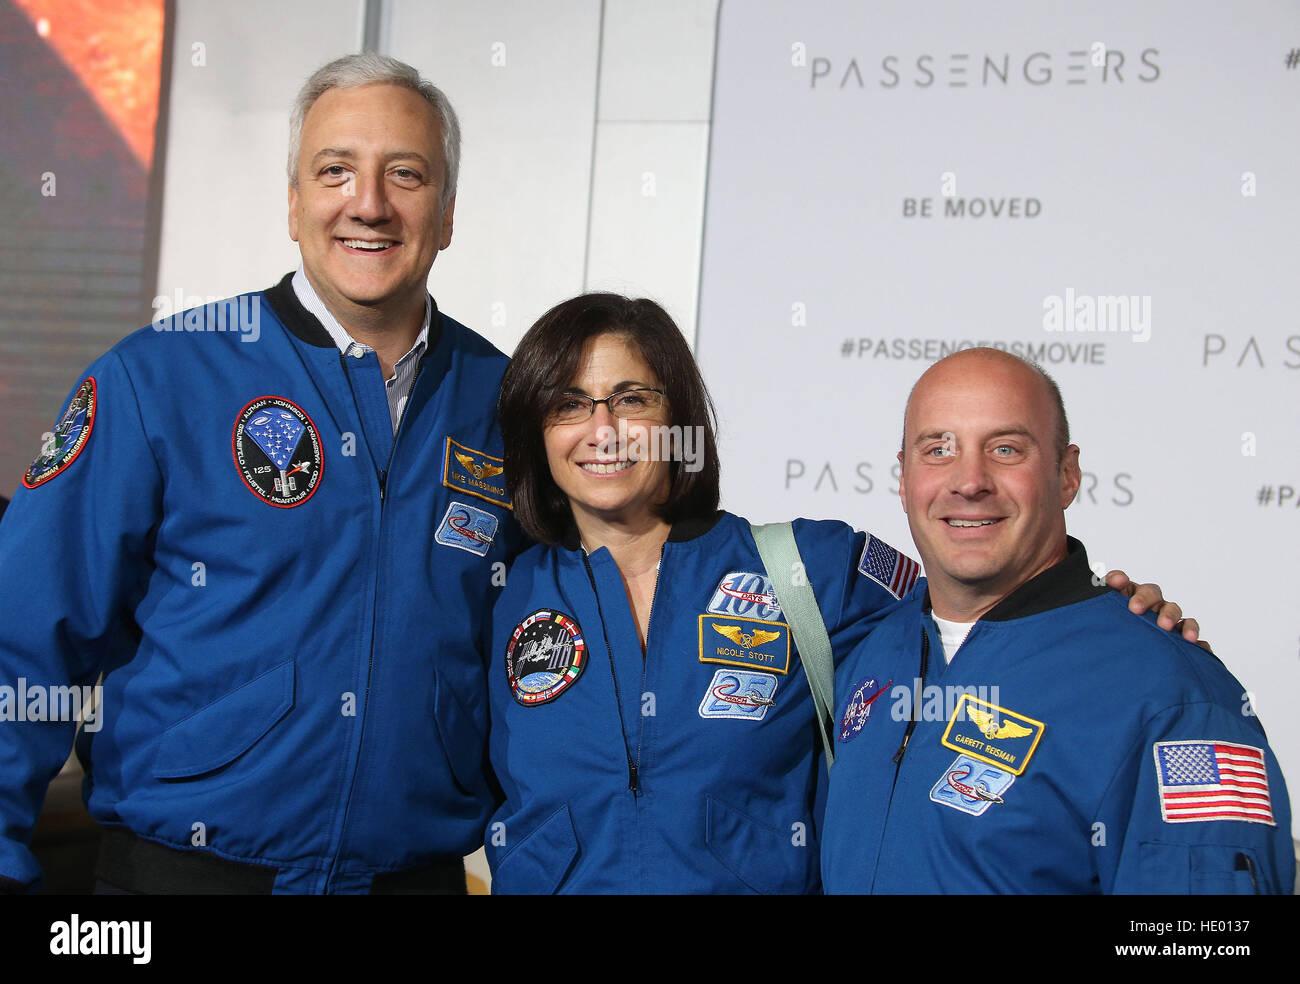 Westwood, CA, USA. 14th Dec, 2016. 14 December 2016 - Westwood, California - Astronauts, Garrett Reisman, Michael - Stock Image